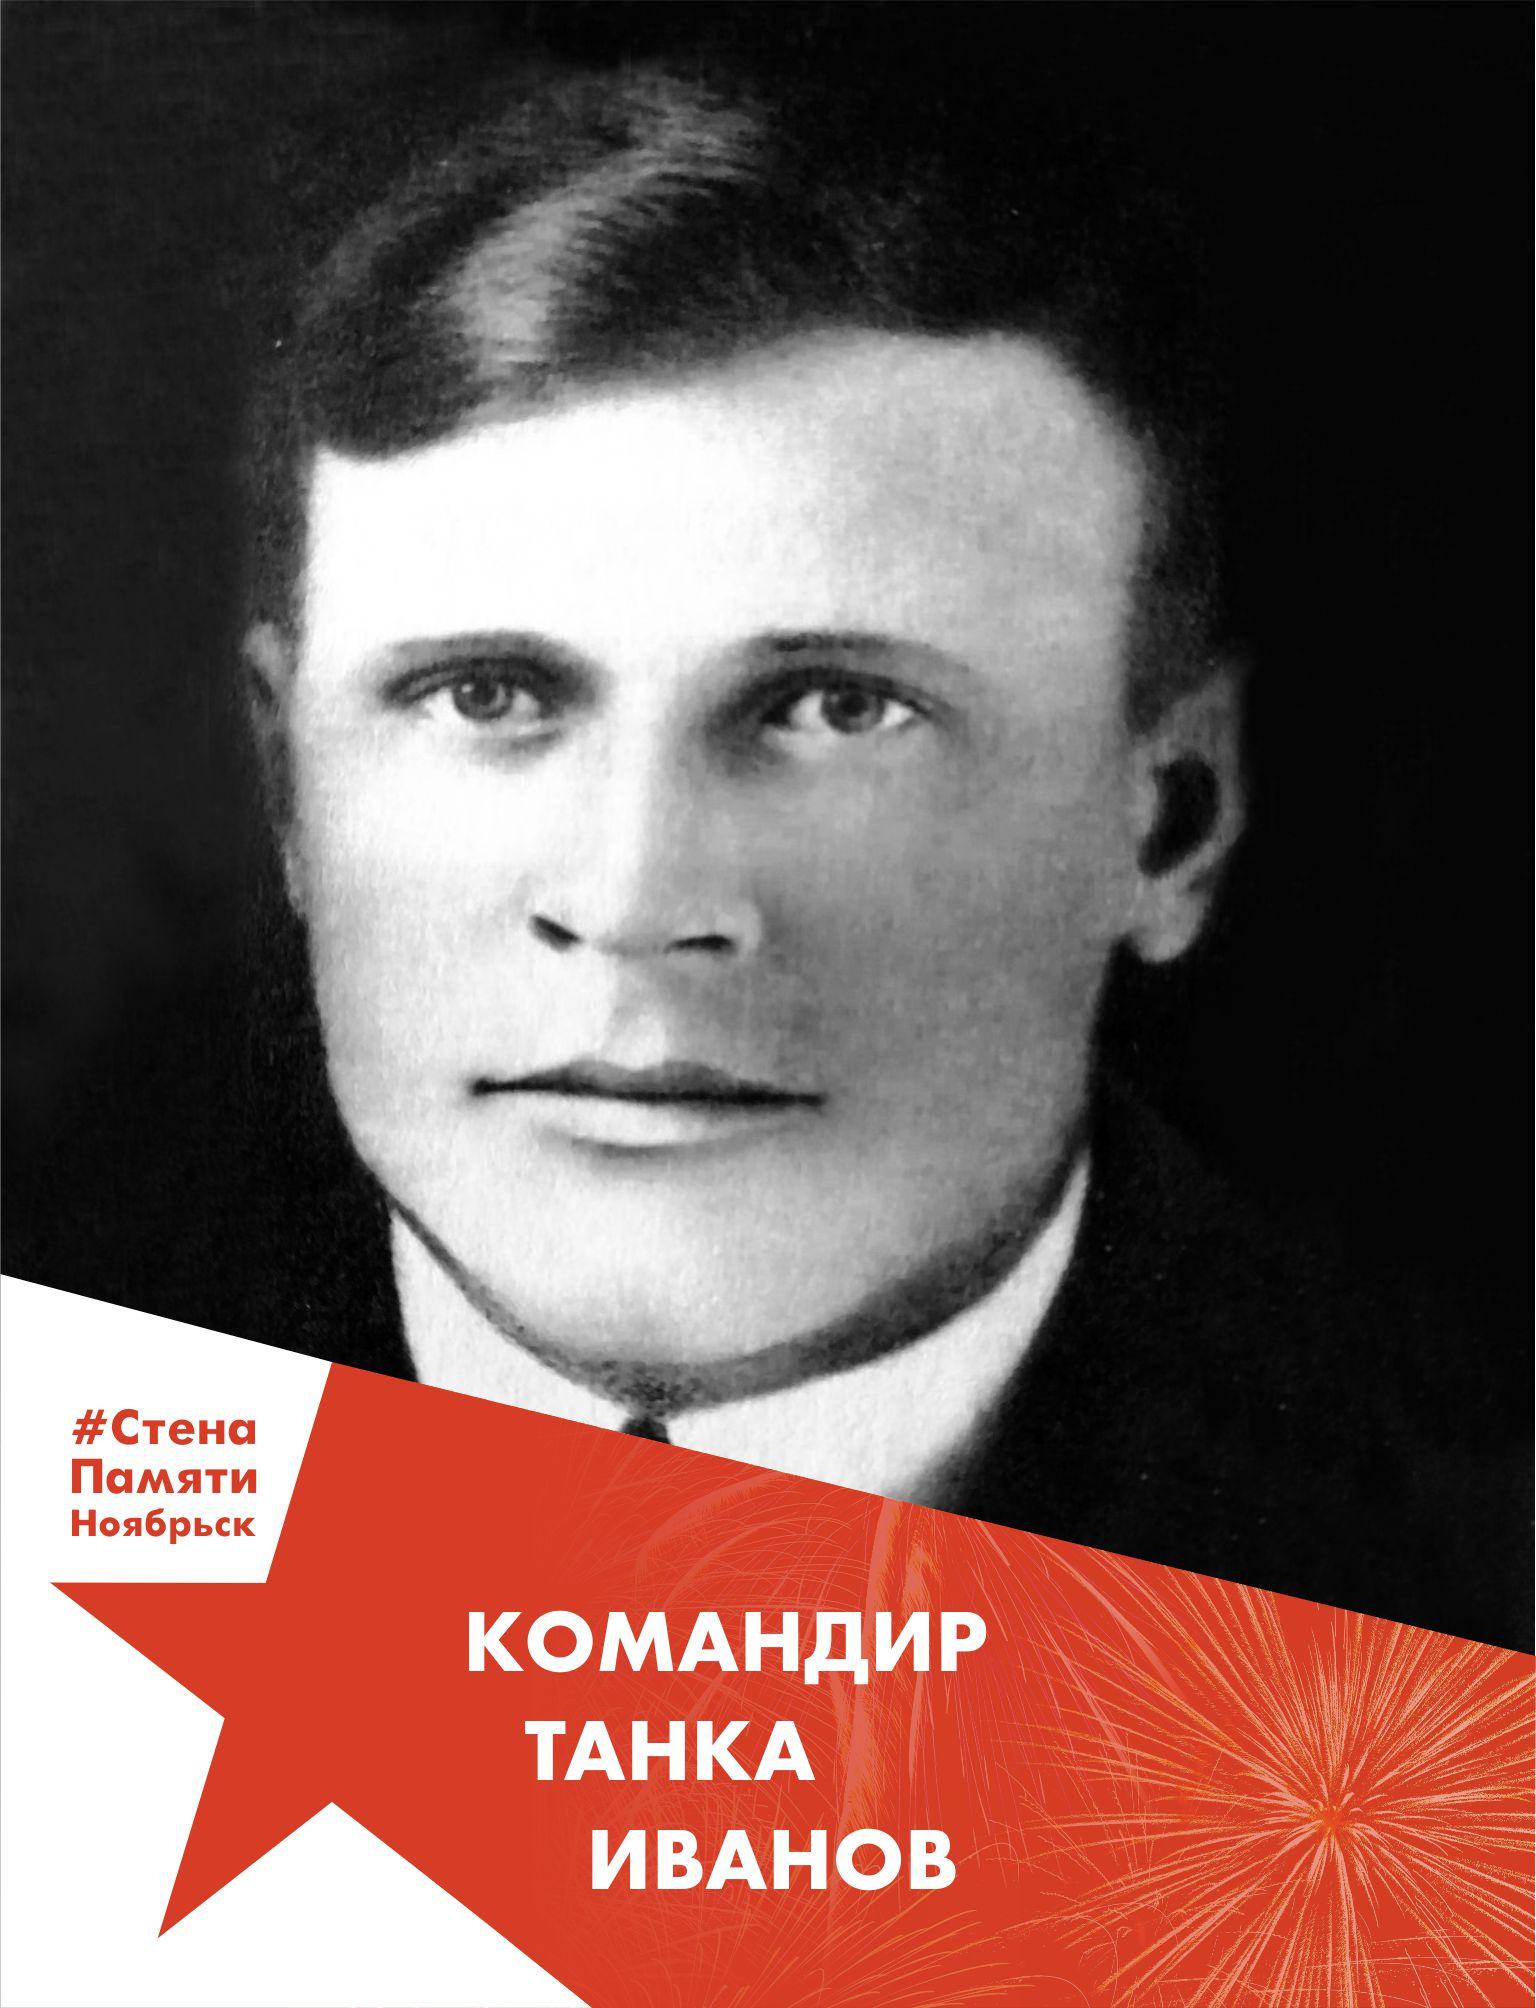 Командир танка Иванов